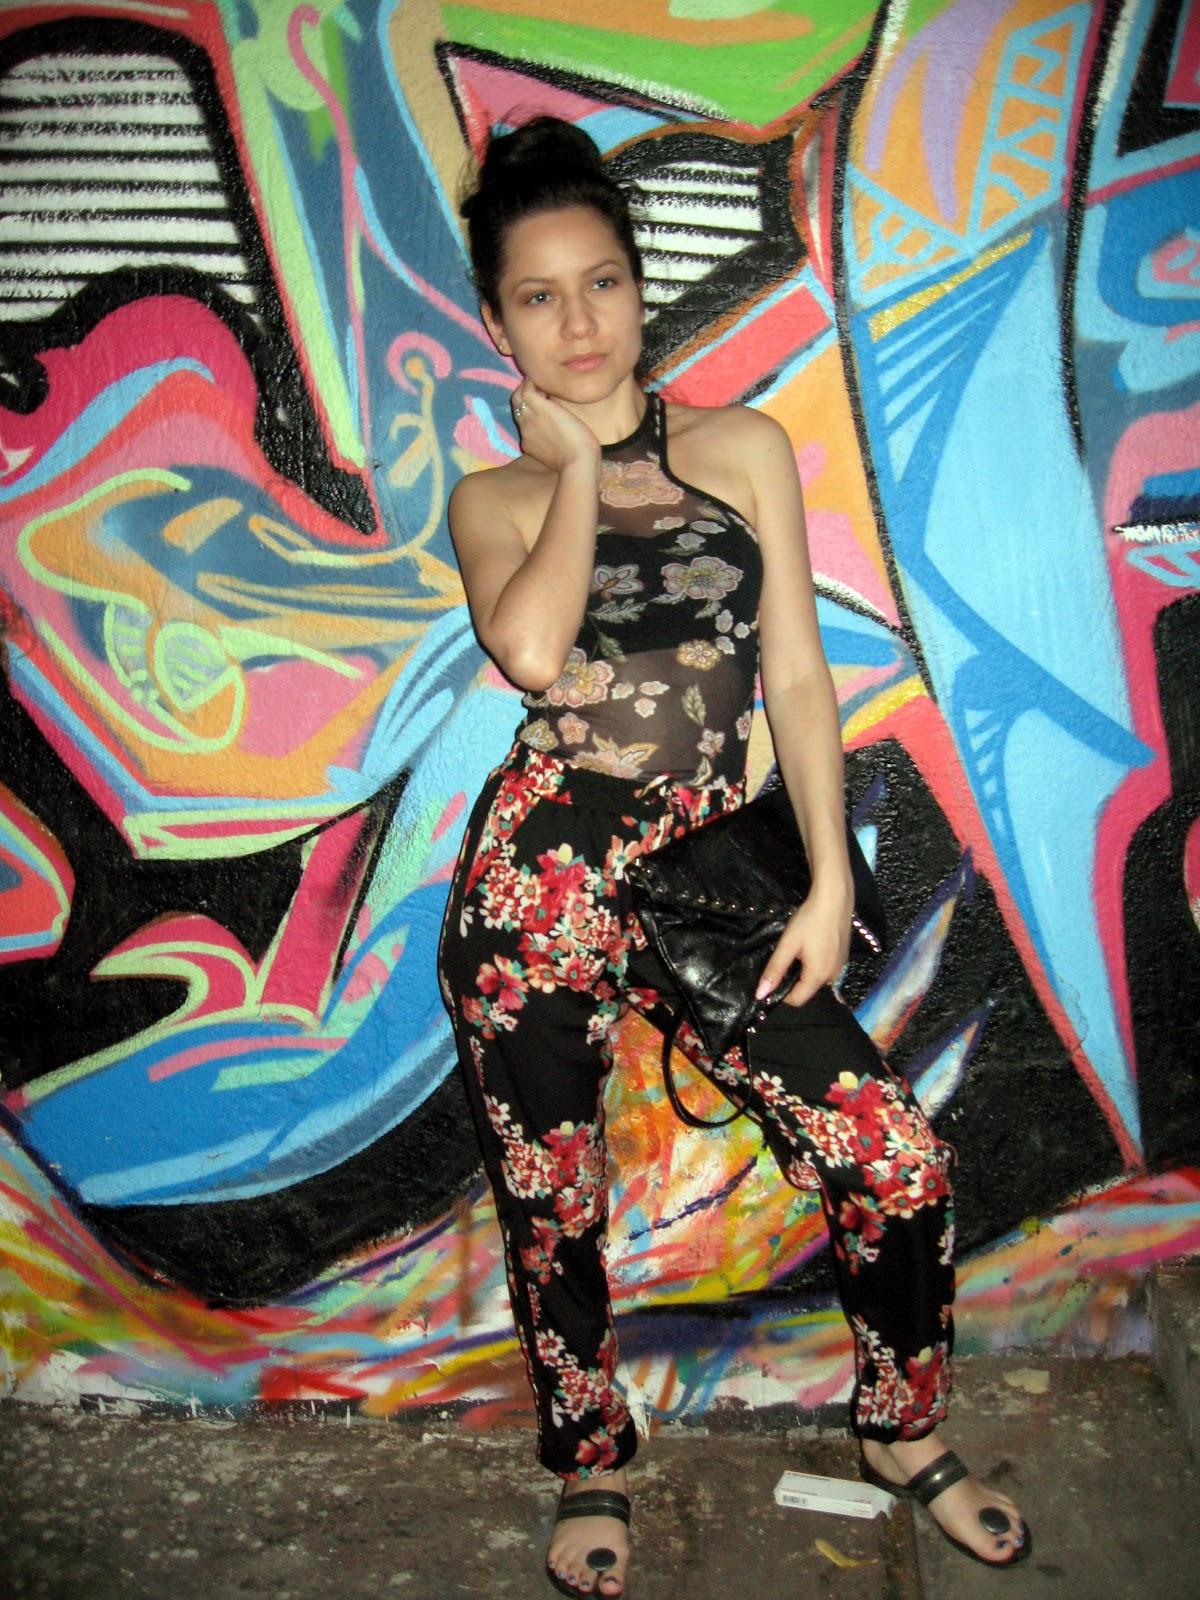 terranova sheer floral tank top, terranova floral pants, black flip flops, black studded clutch, messy bun, casual look, street graffiti art